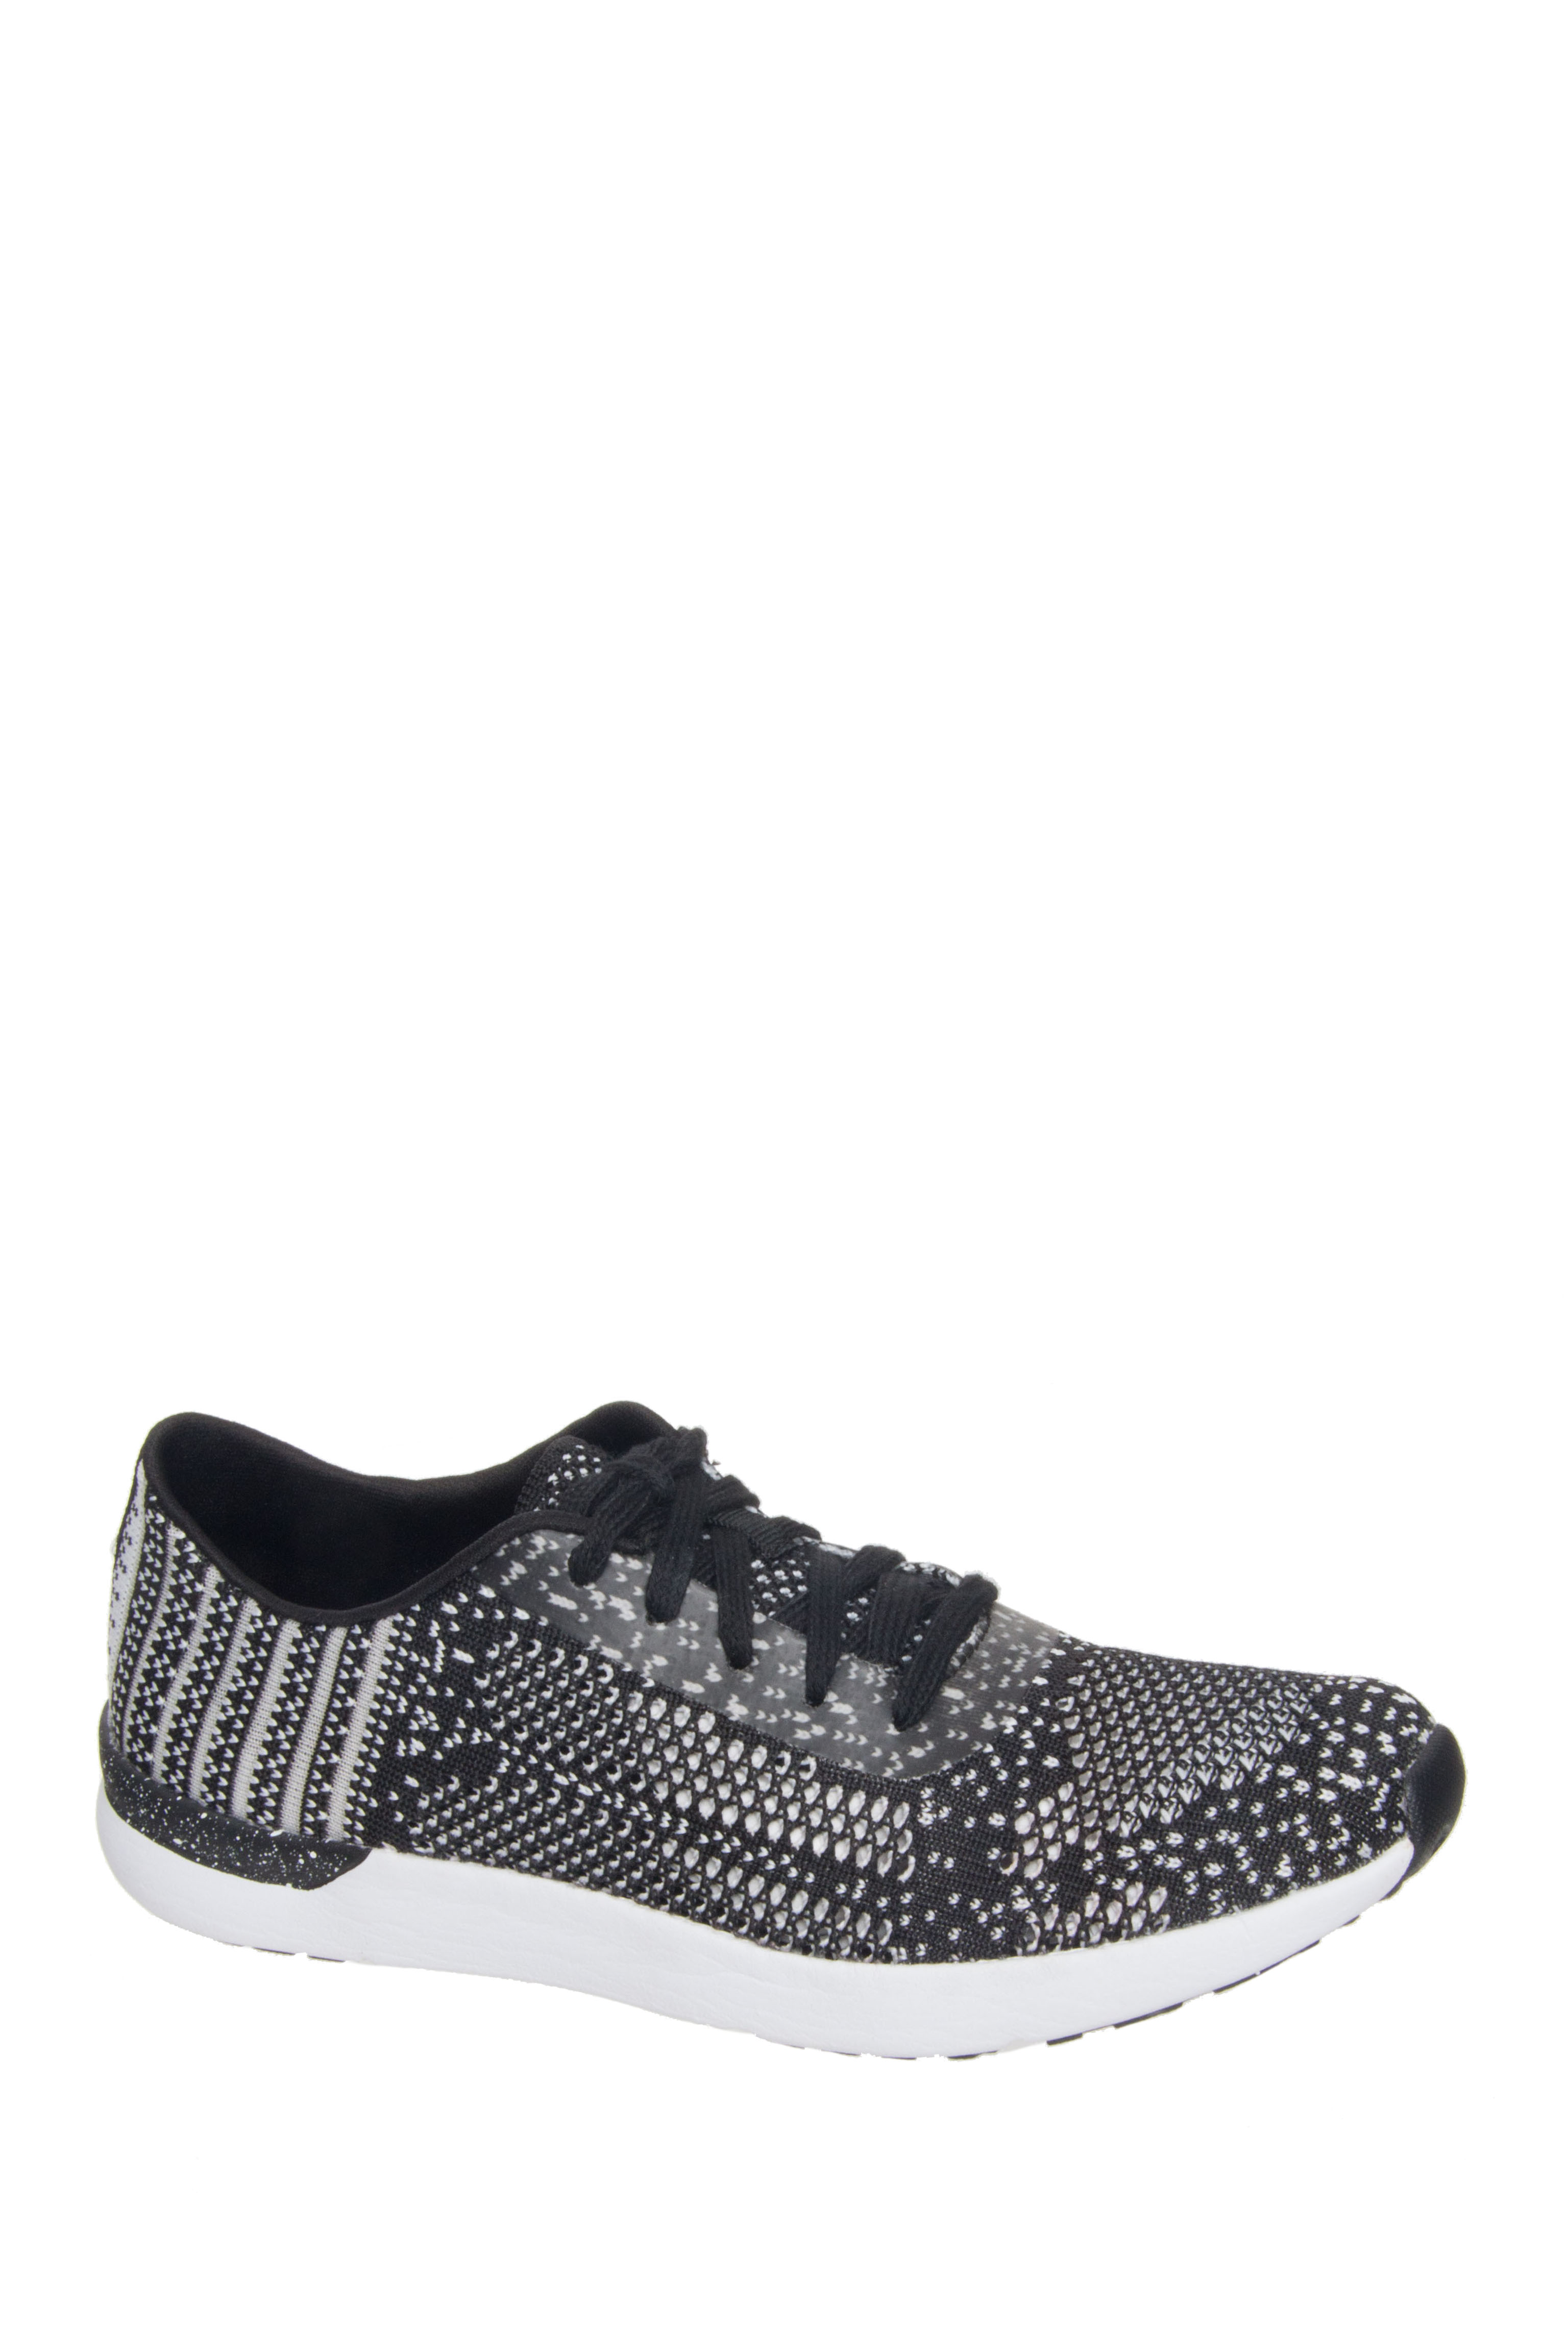 Jessica Simpson Fitt Low Top Sneakers - Black / White